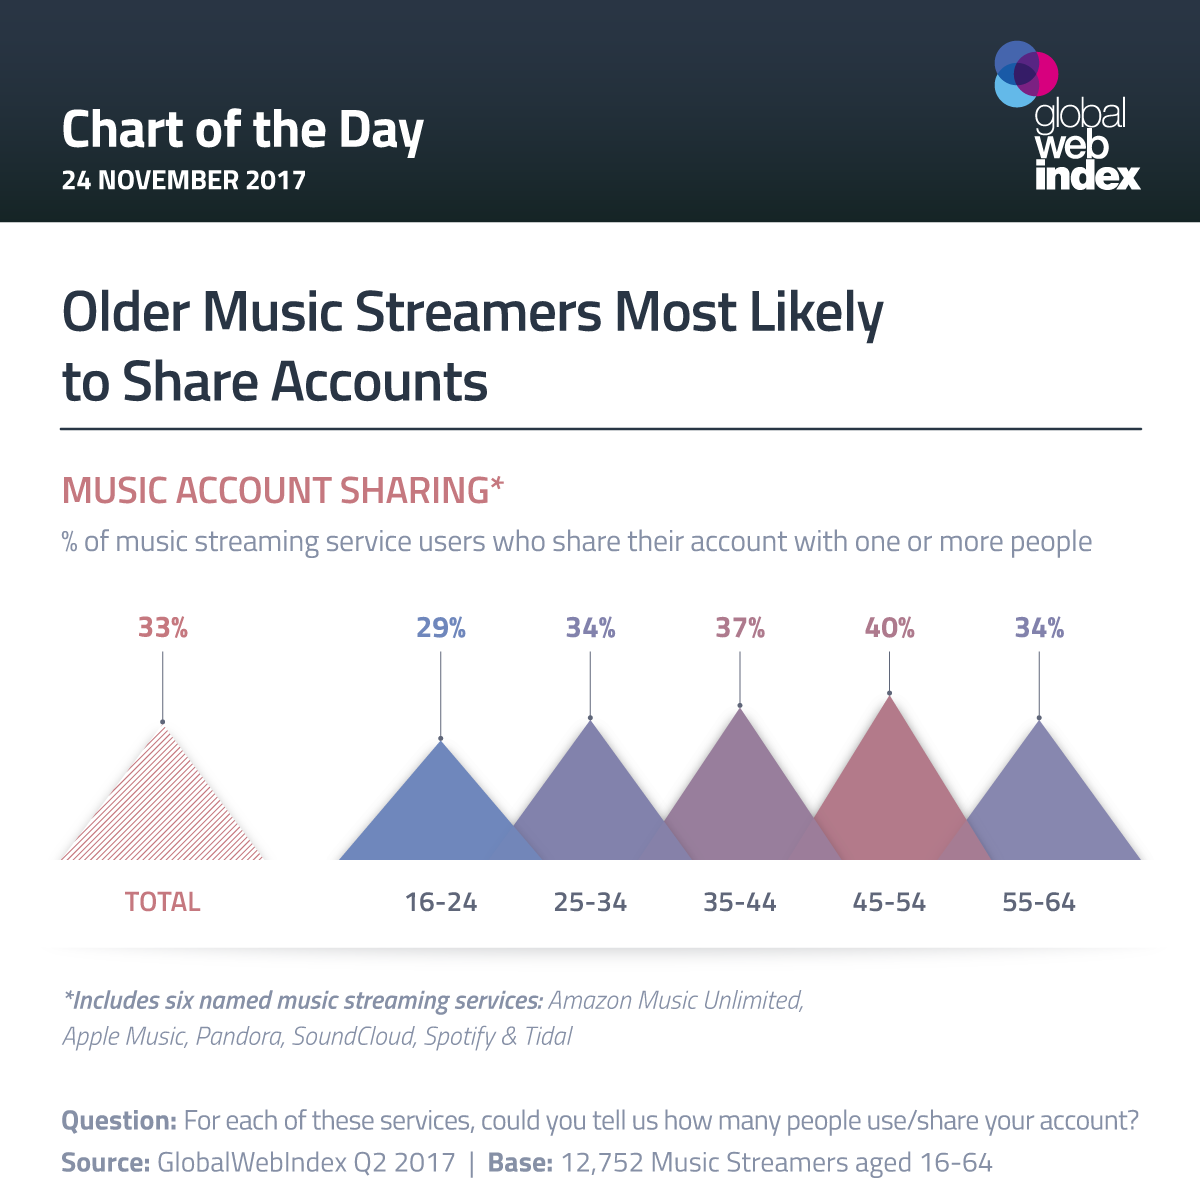 older music streamers